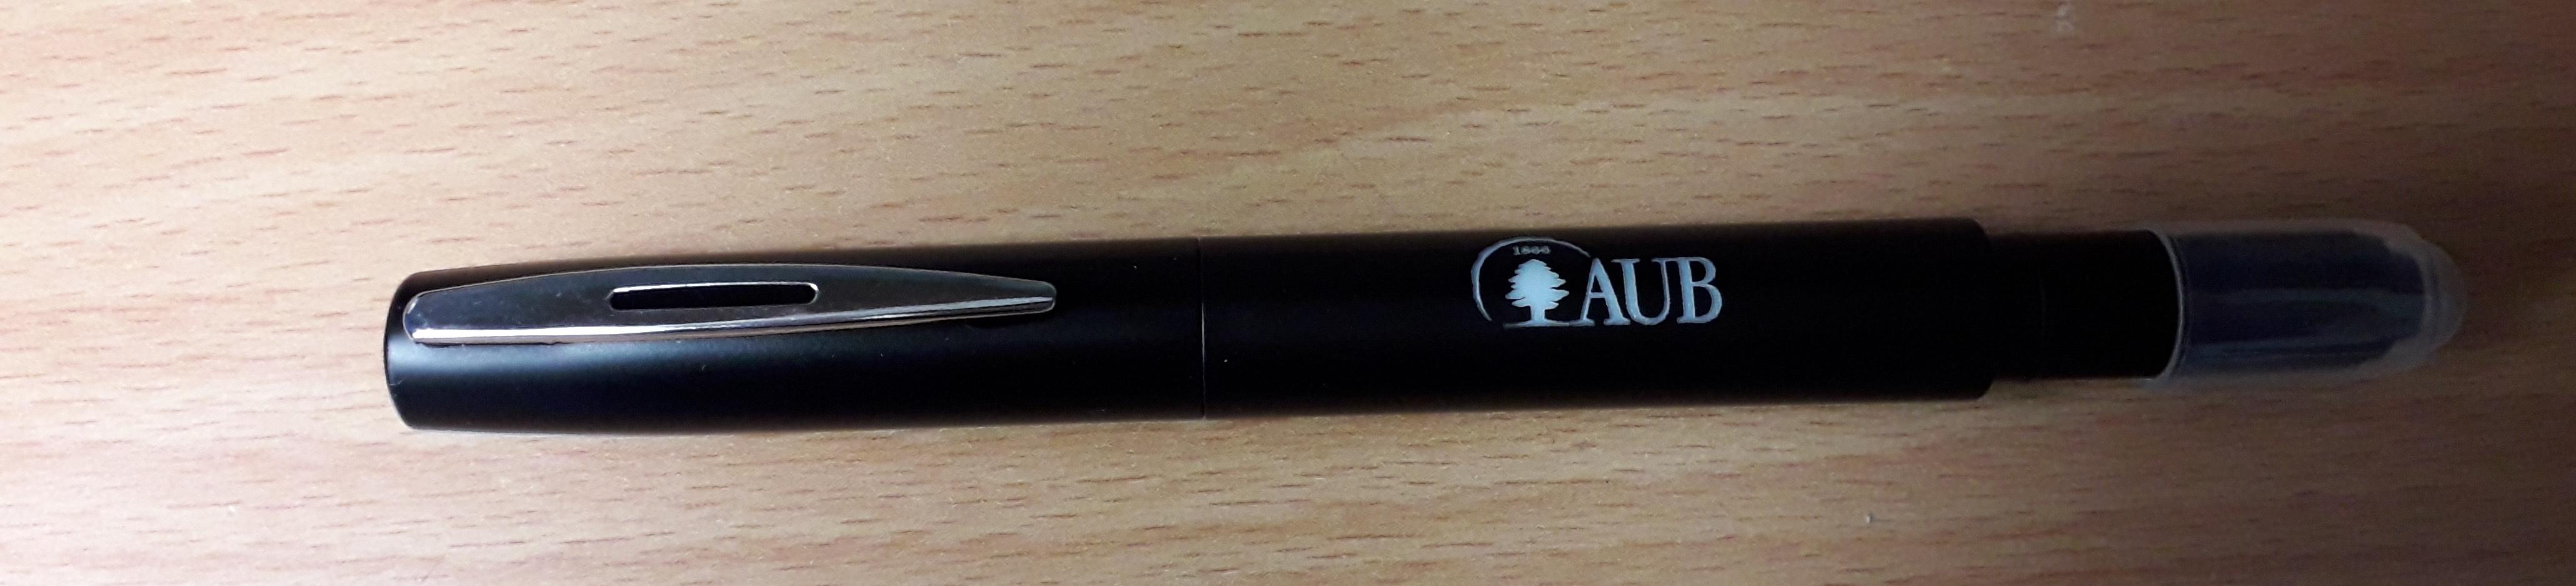 AUB   Ball Pen   Laser   W/Stylus   Black